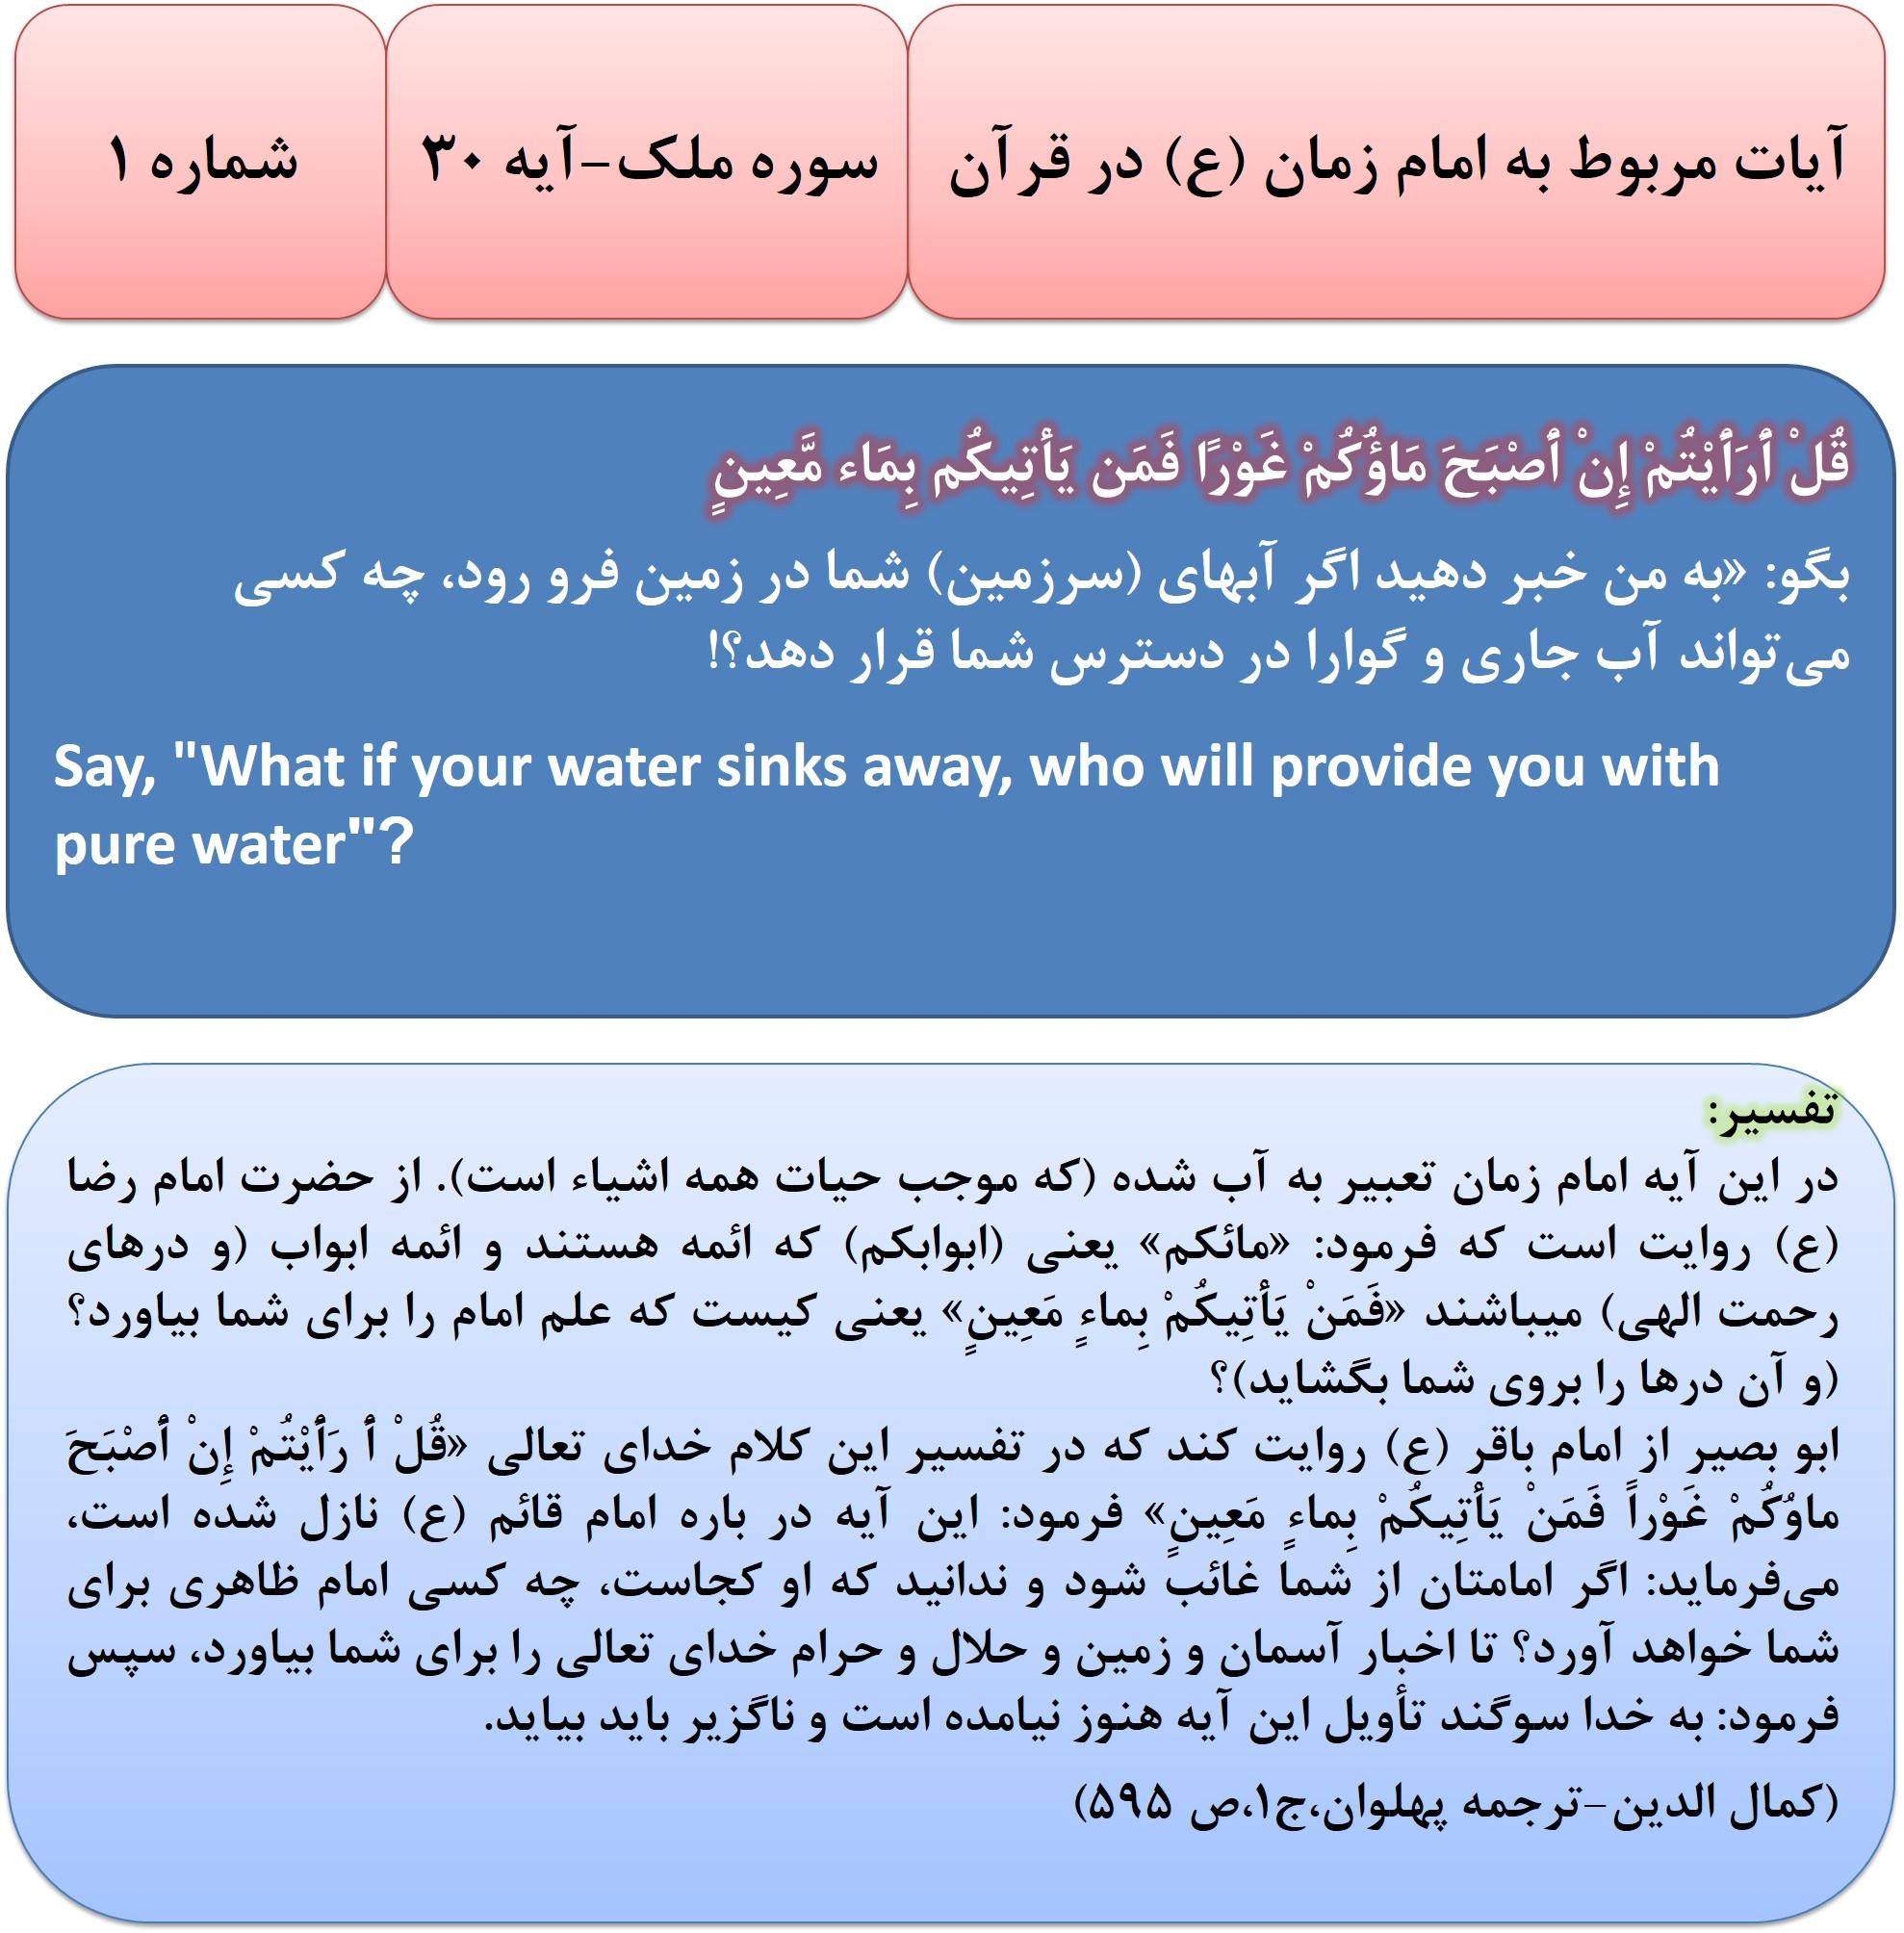 http://bayanbox.ir/view/2131734774386536329/Mahdi-In-Quran-1.jpg